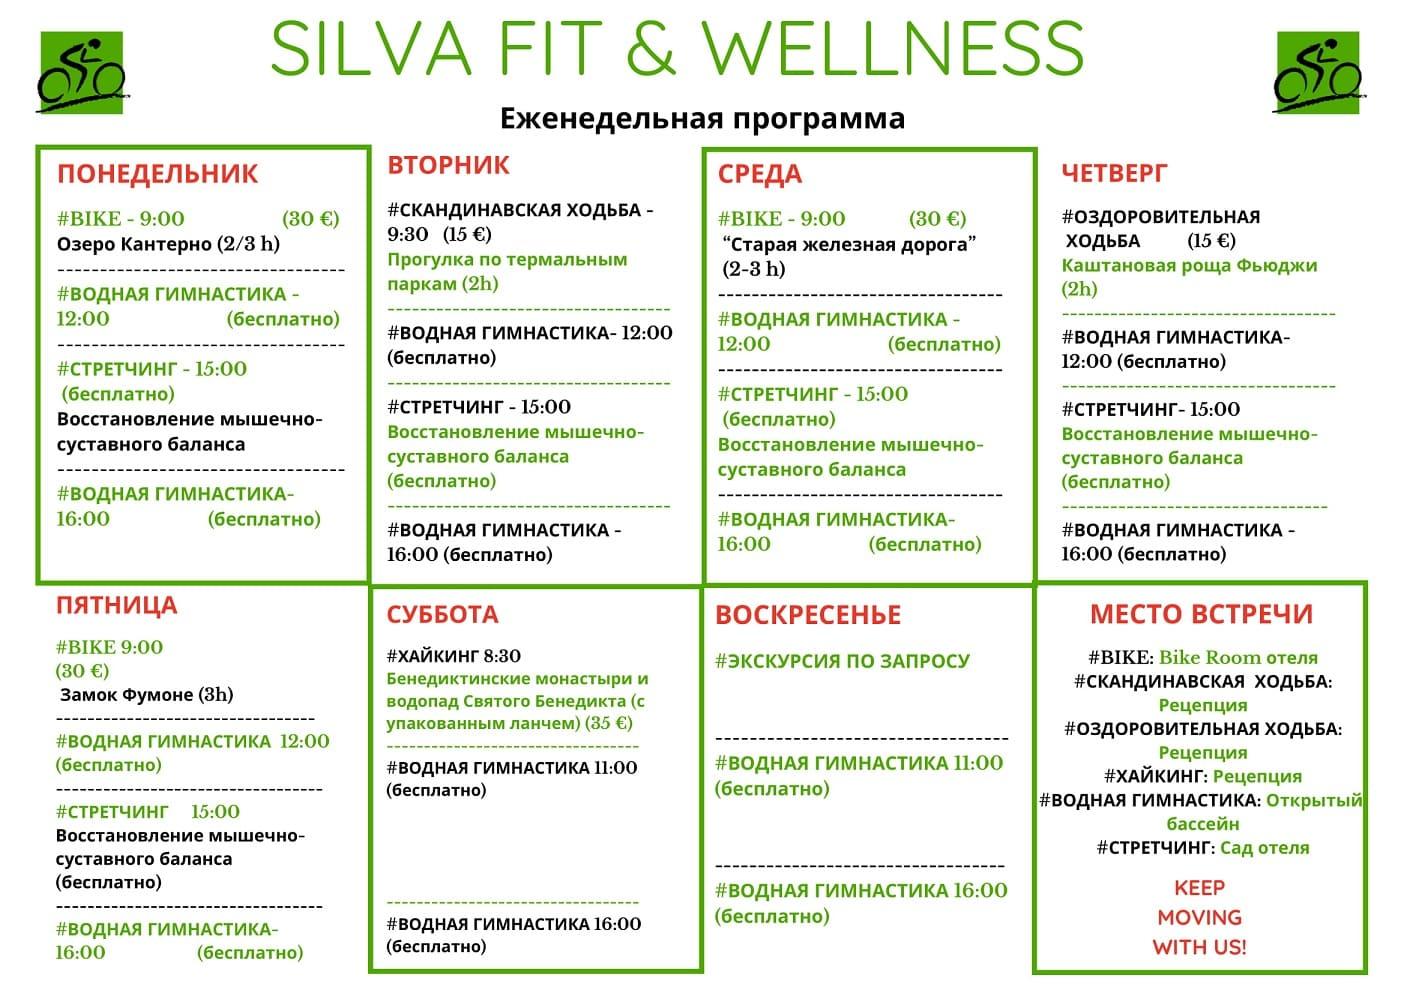 Ежедневная программа спортивных занятий в Silva Hotel Splendid